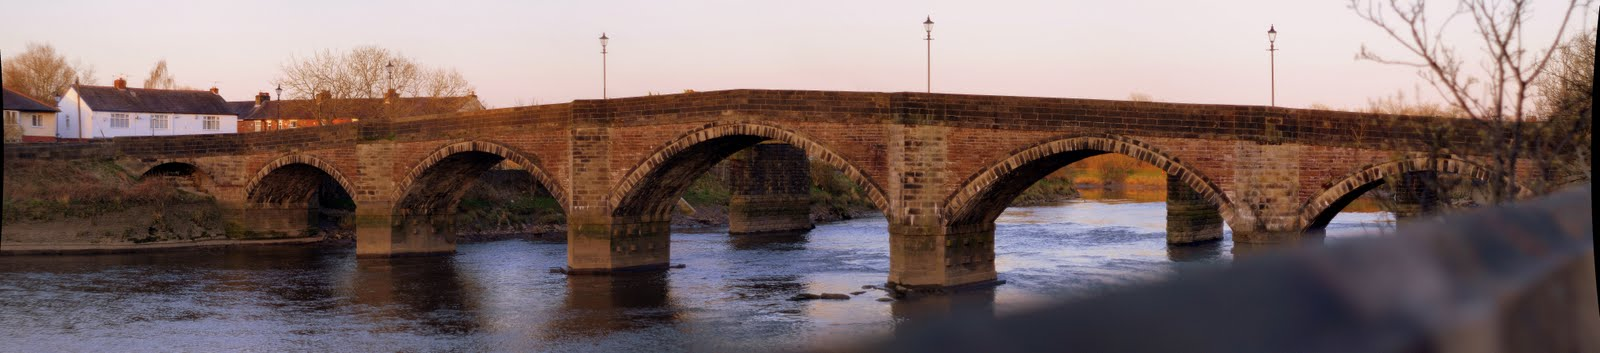 bridgepan1.tif